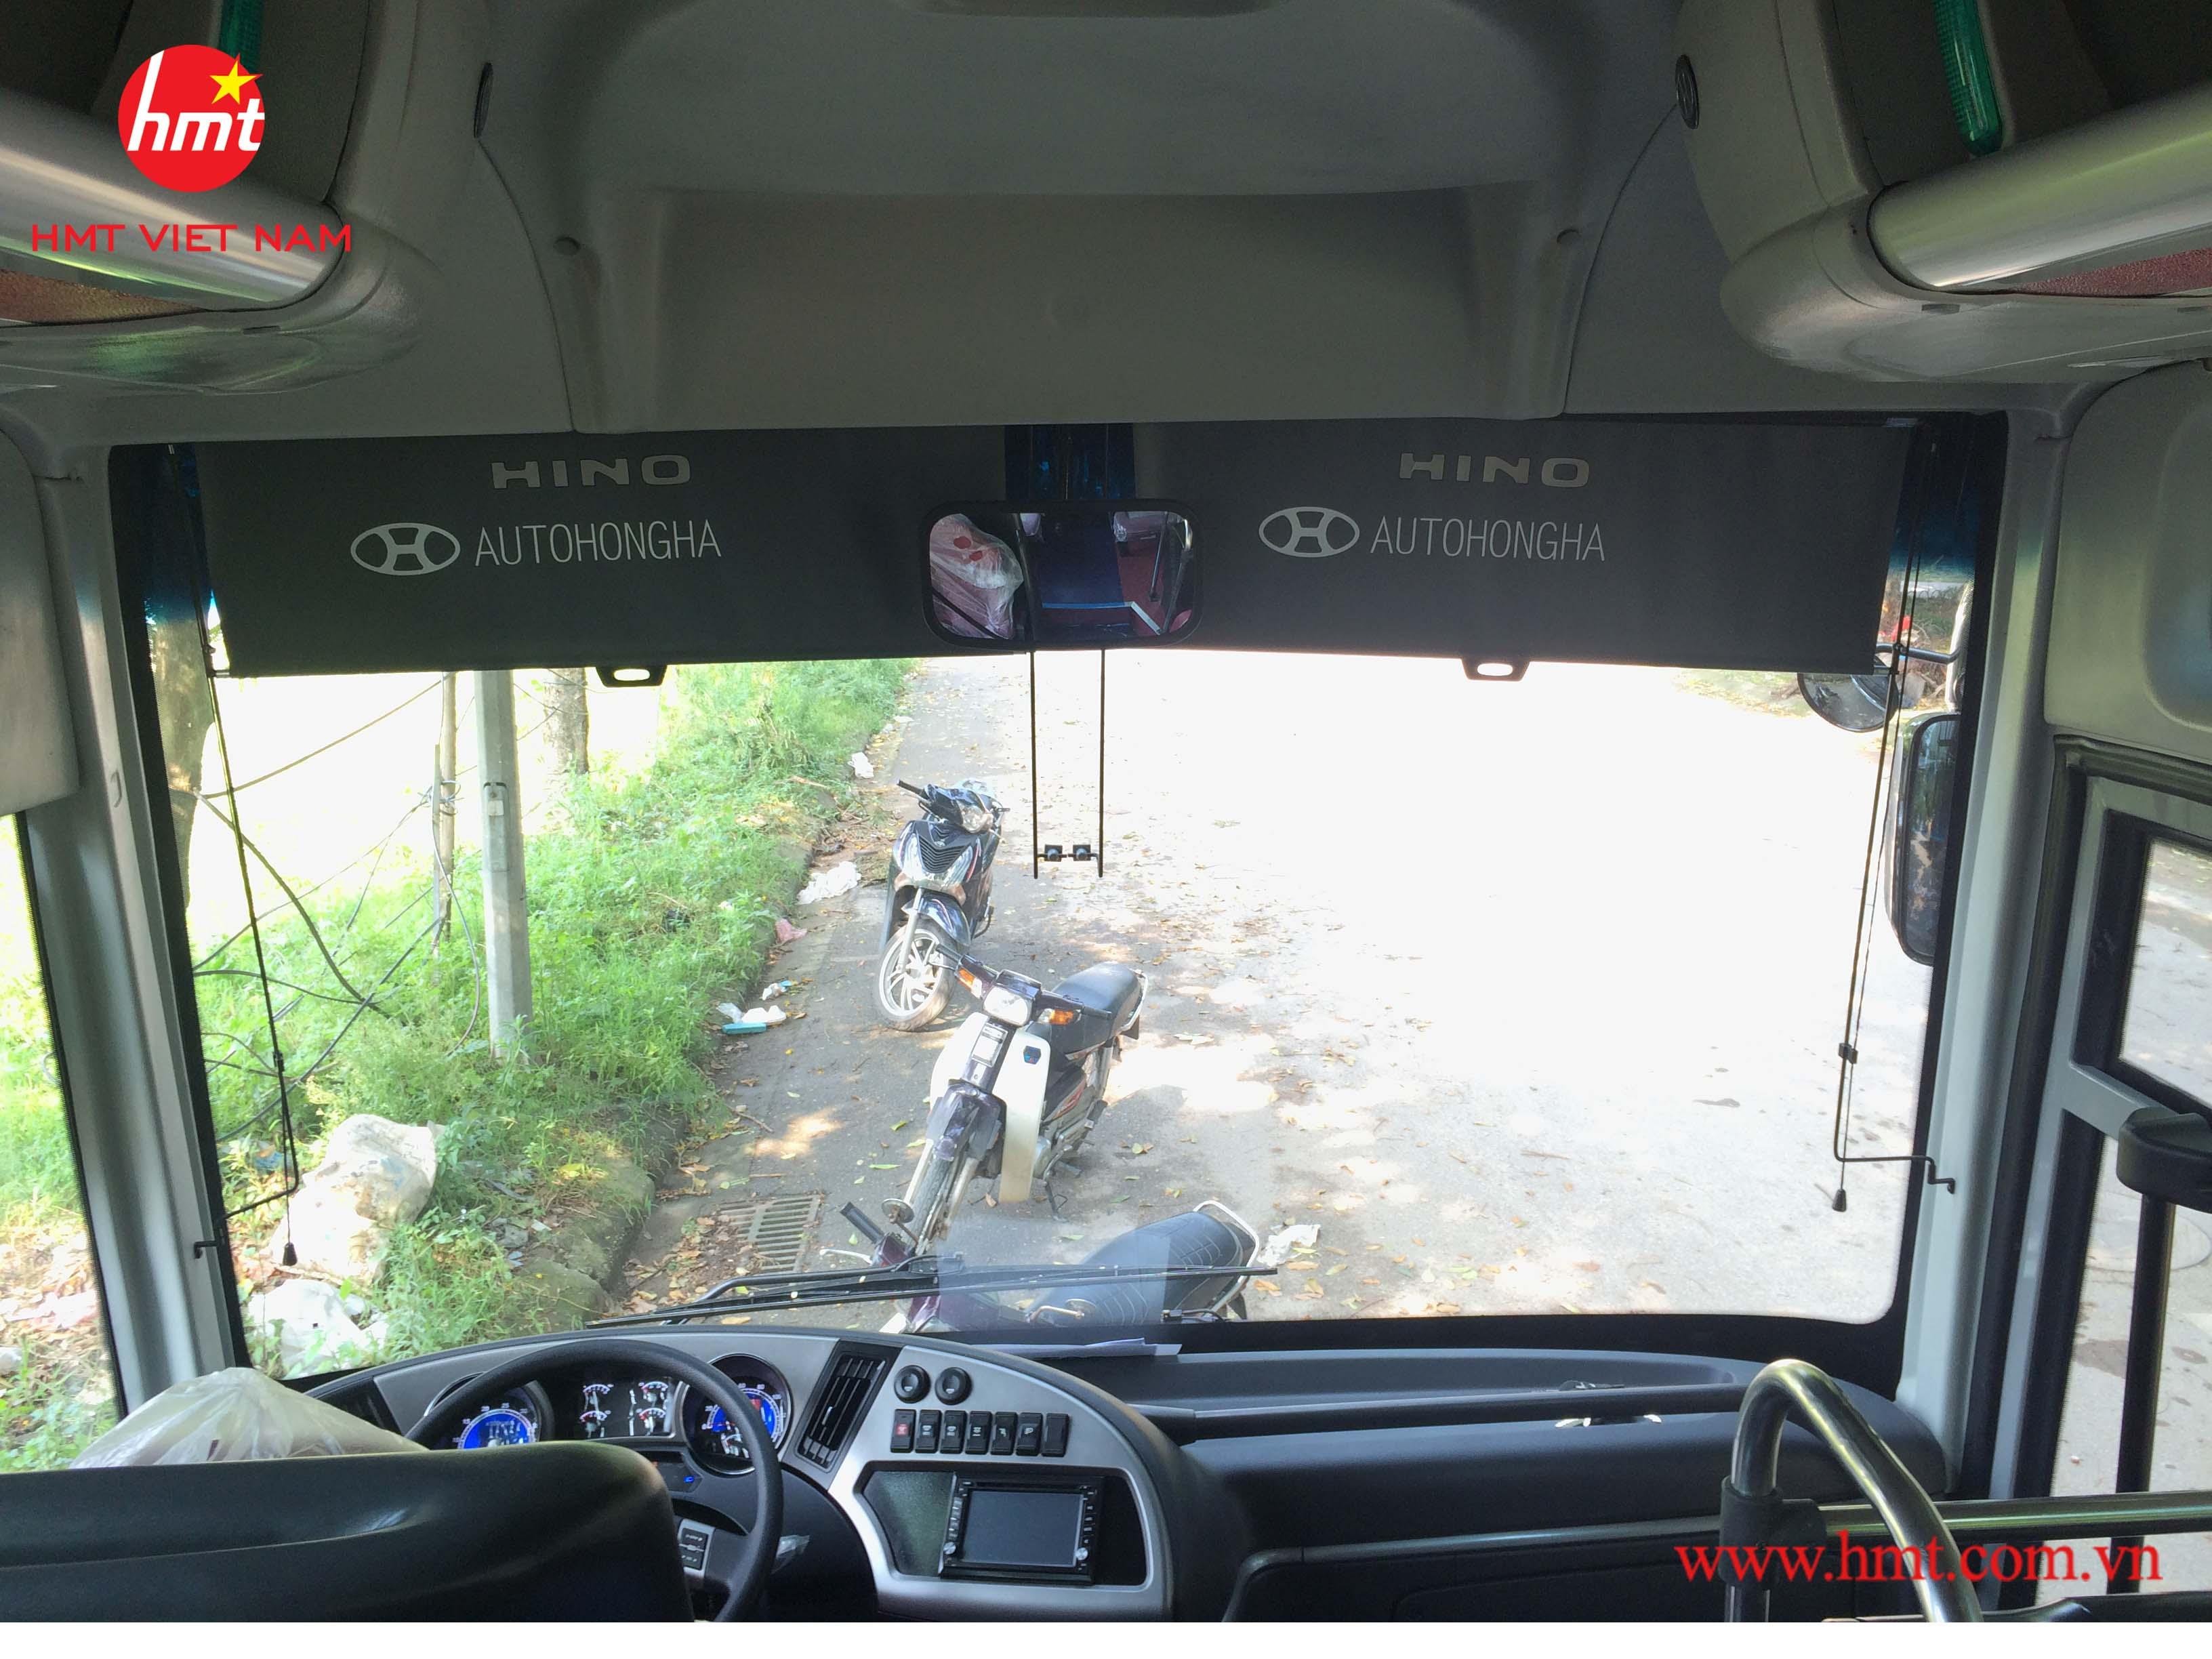 xe-khach-47-hong-ha-dong-co-hino-bau-hoi-17